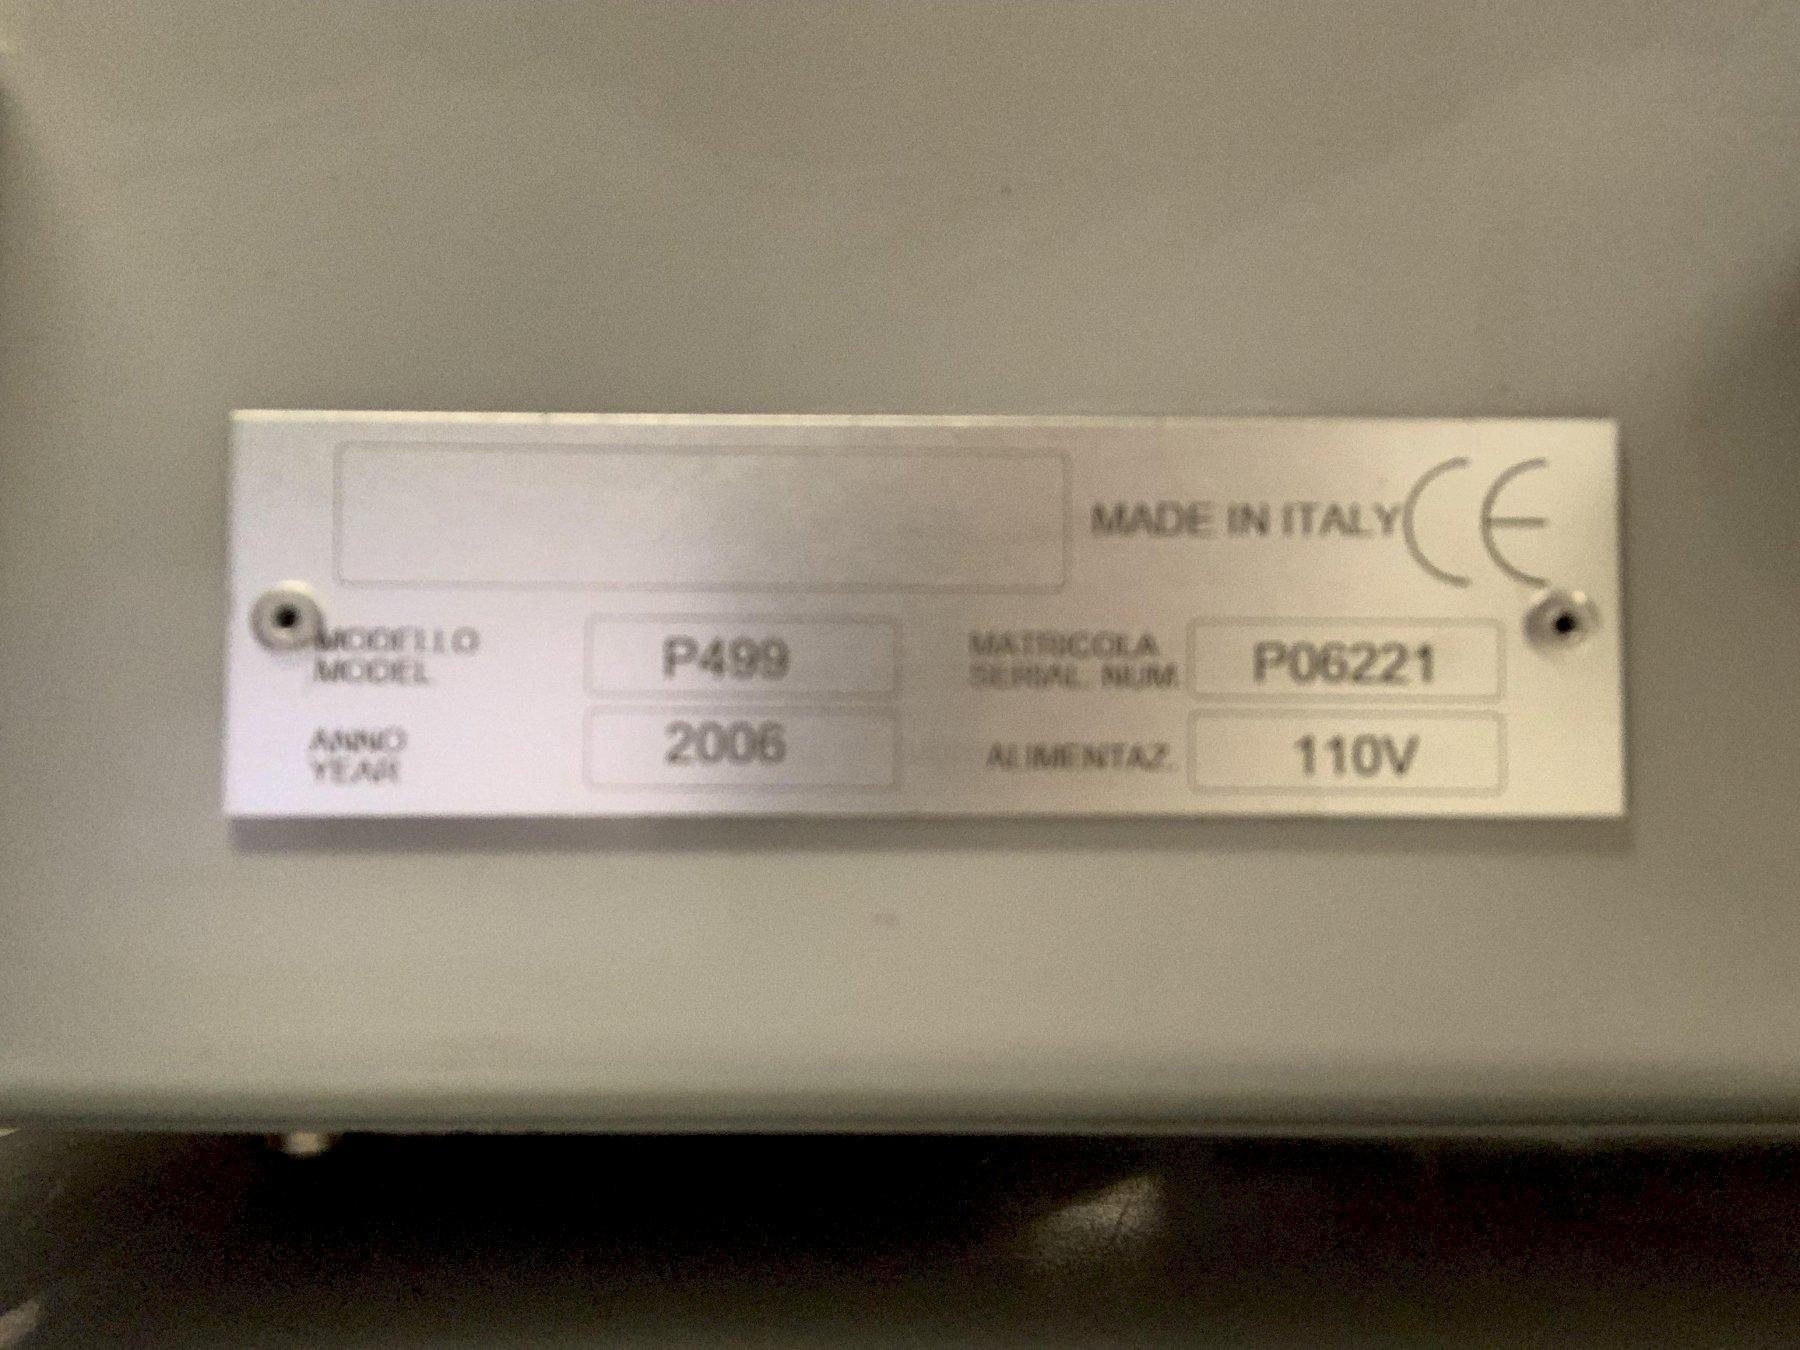 Dorian Model P499 Tool Pre Setter, New 2006.